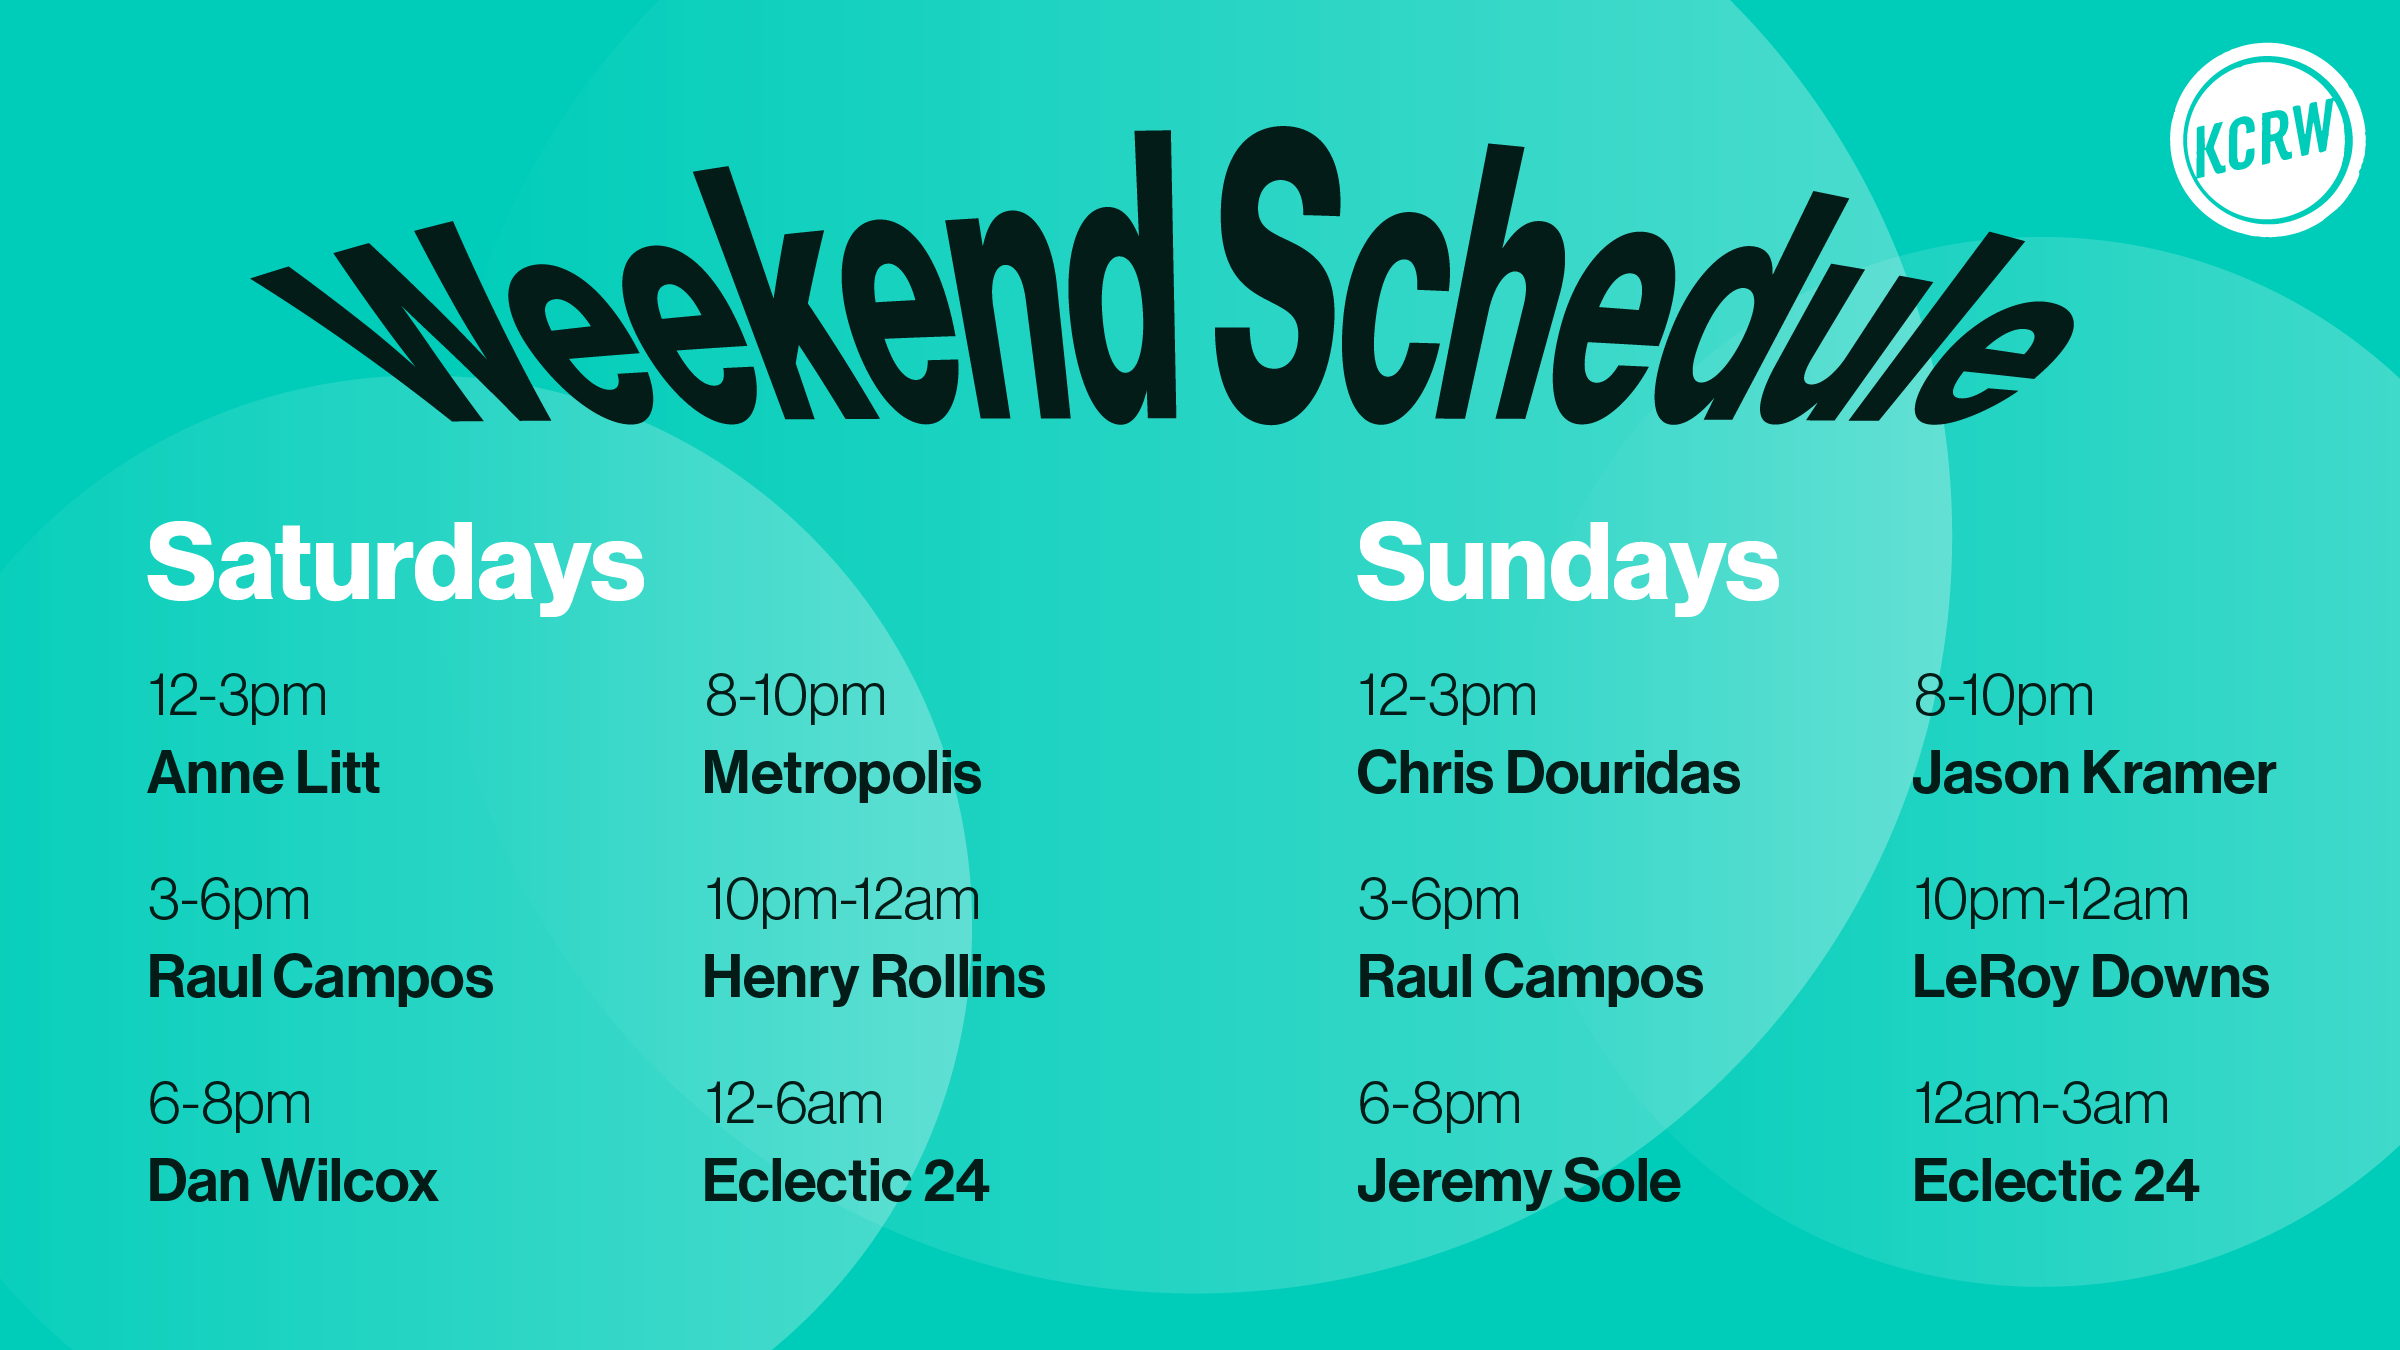 Weekend Schedule  Mon-Fri, Feb 22-26 8-11pmTravis  Saturday, Feb 27 12-3pmAaron 3-6pmChris 6-8pmKramer 8-10pmMetropolis 10-midRollins  Sunday, Feb 28 12-3pmAaron 3-6pmChris 6-8pmKramer 8-10pmJose 10-midMoses  Mon-Fri, Mar 1-5 8-11pmTravis  Saturday, Mar 6 12-3pmAaron 3-6pmChris 6-8pmKramer 8-10pmMetropolis 10-midRollins  Sunday, Mar 7 12-3pmAaron 3-6pmChris 6-8pmKramer 8-10pmJose 10-midMoses  Mon-Fri, Mar 8-12 8-11pmGarth Saturday, Mar 13 12-3pmRaul 3-6pmAnne 6-8pmDan 8-10pmMetropolis 10-midRollins Sunday, Mar 14 12-3pmRaul 3-6pmAnne 6-8pmDan 8-10pmJ Sole 10-midE24